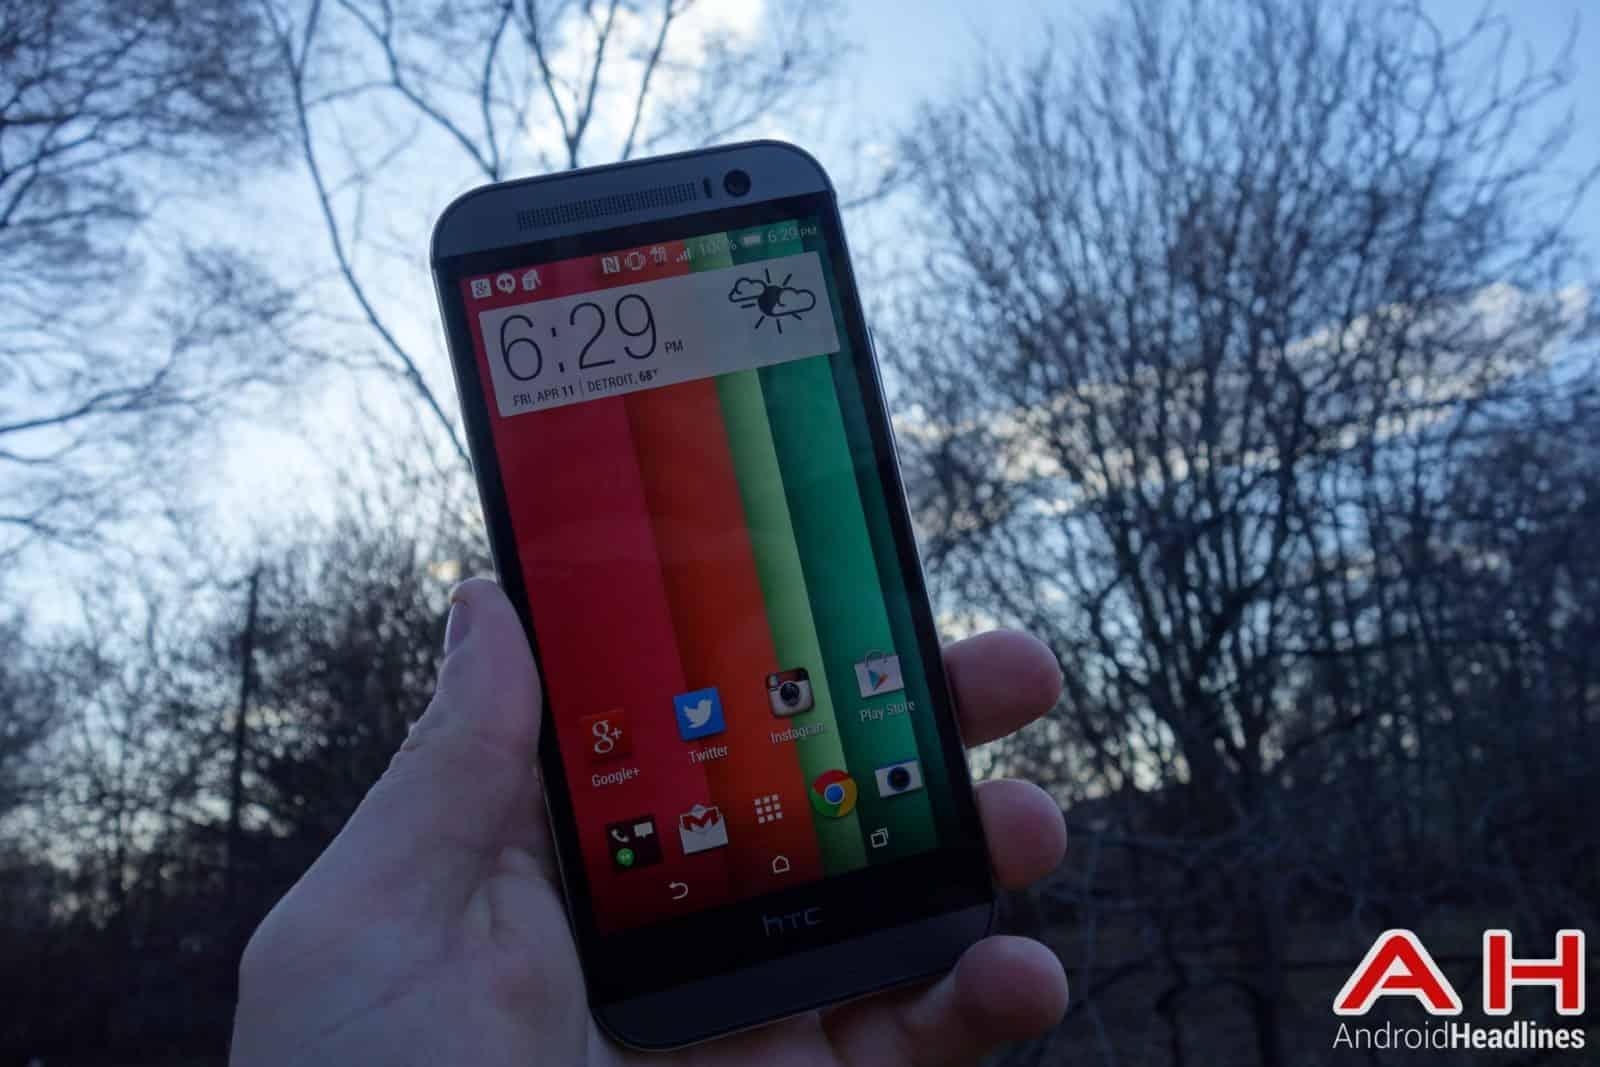 HTC-One-M8 (81)